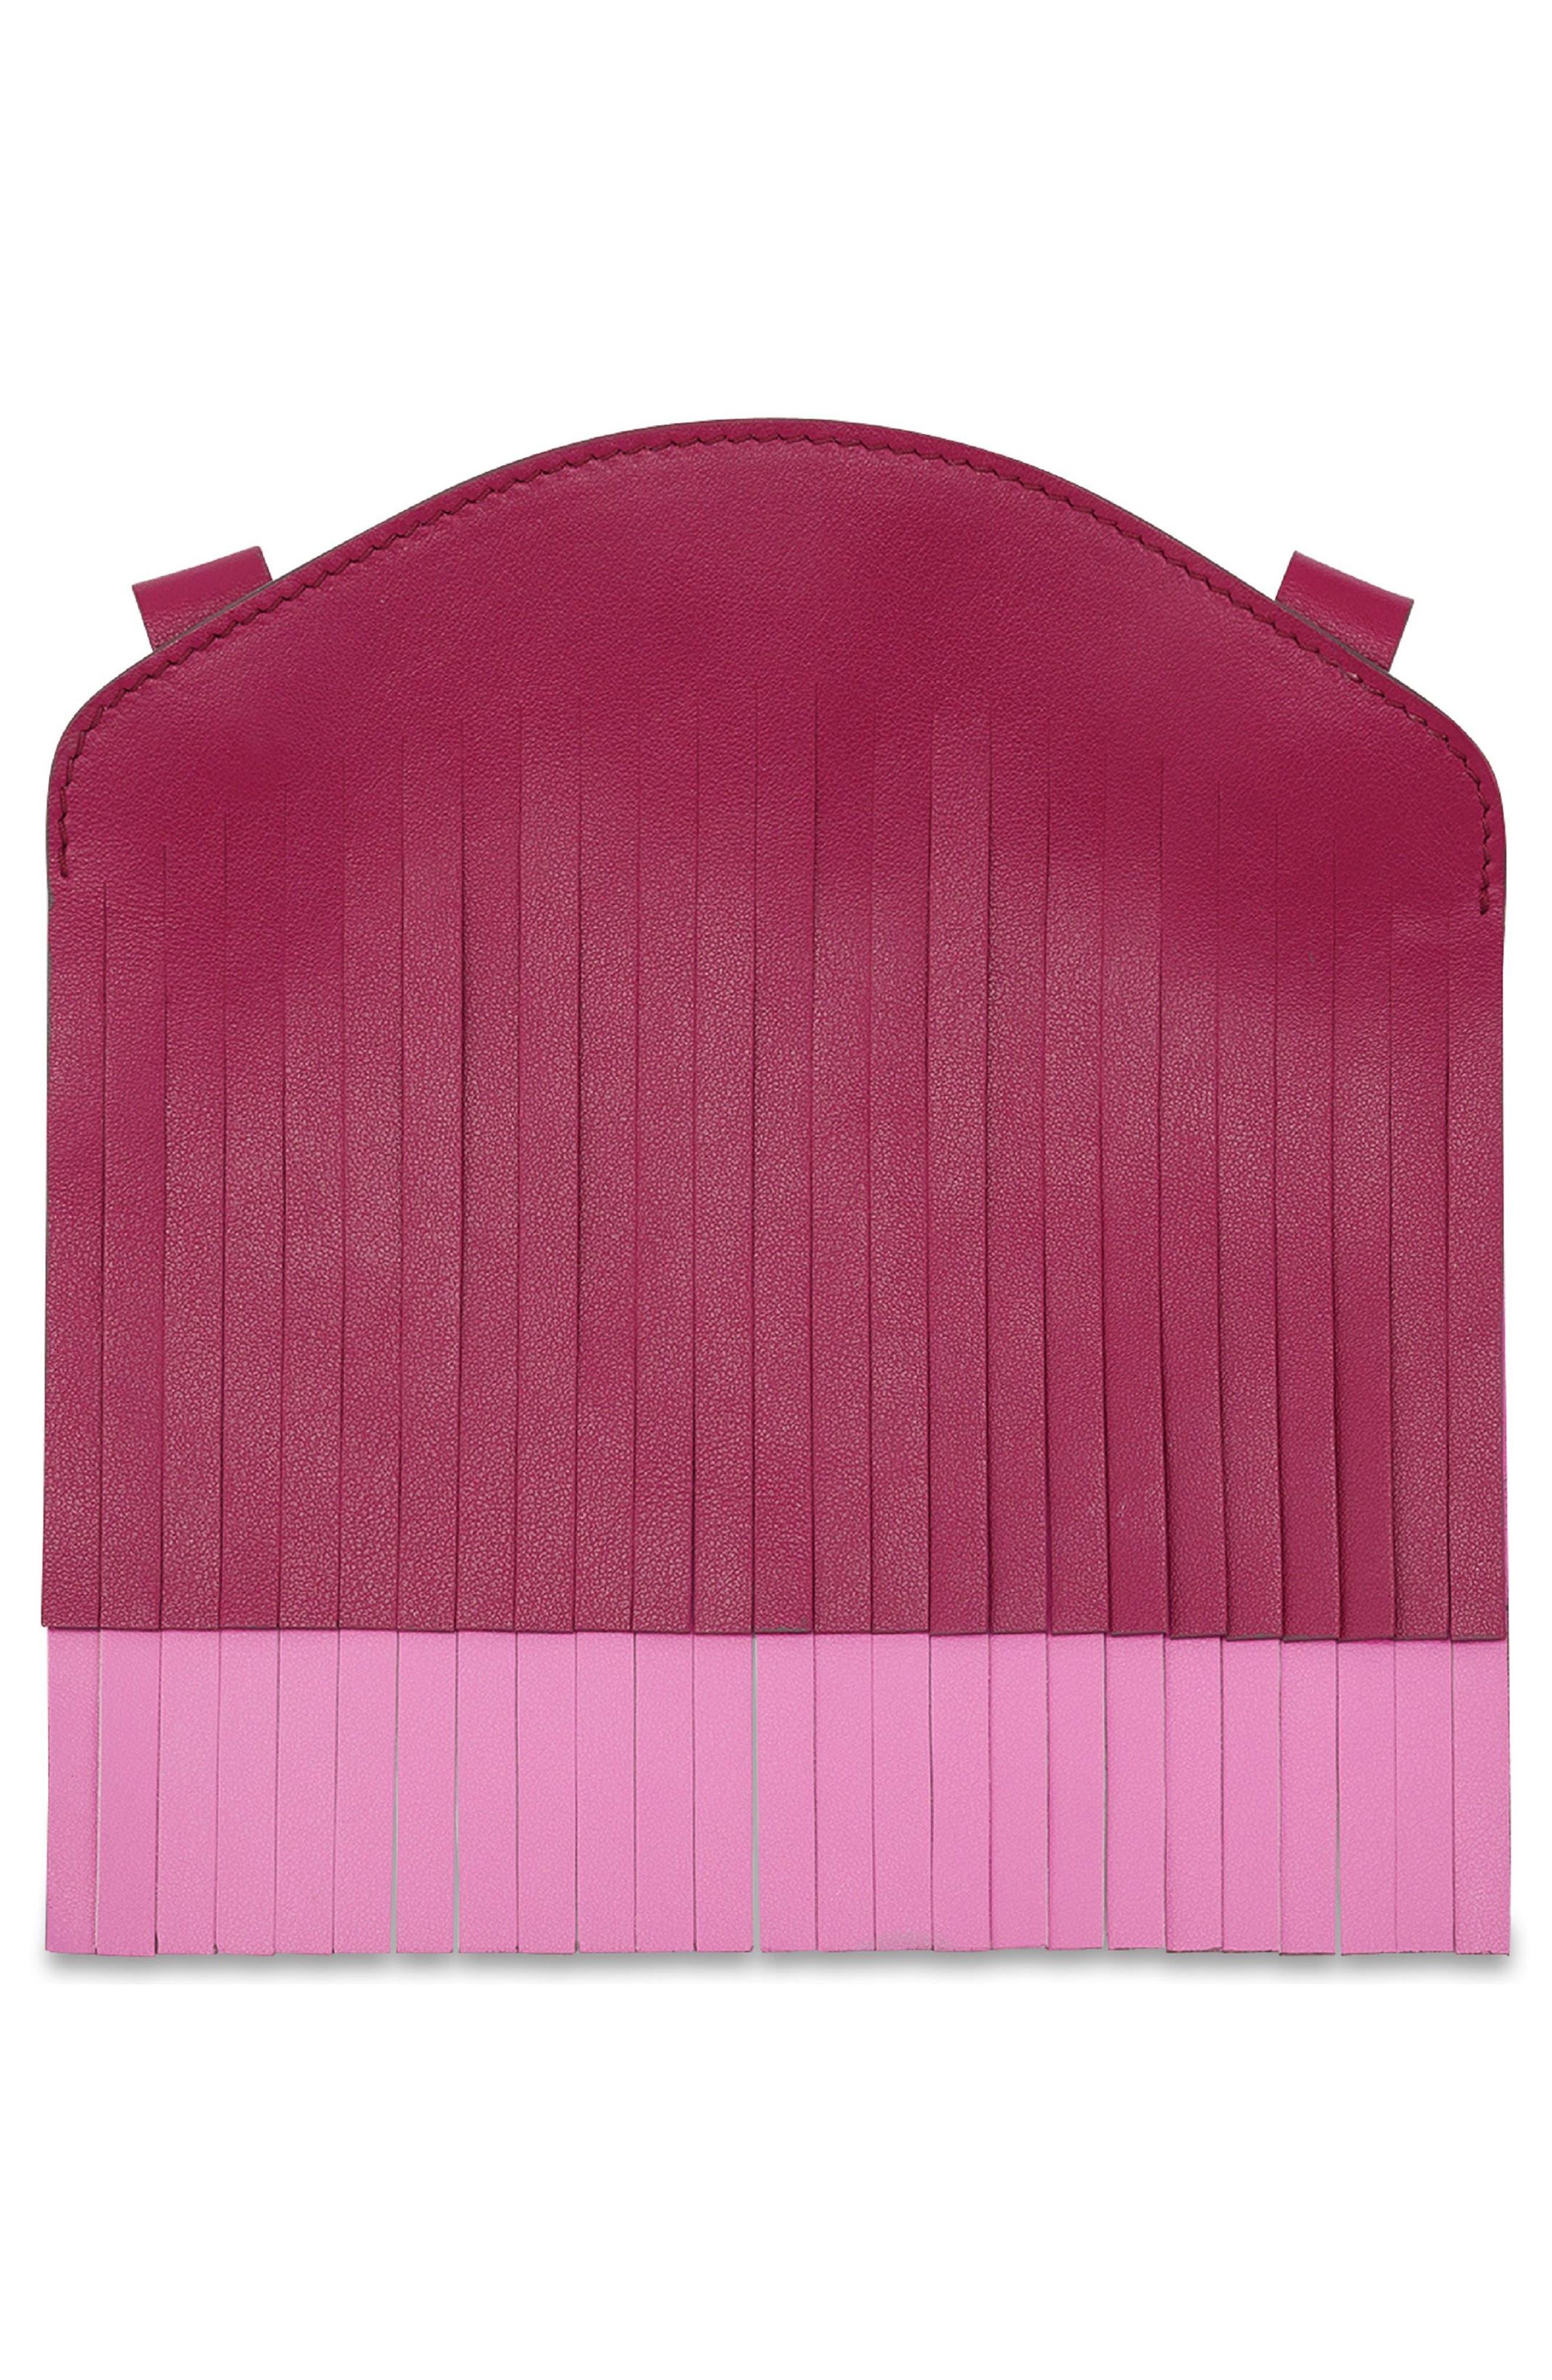 Build a Bag Fringe Leather Panels,                             Alternate thumbnail 3, color,                             Raspberry